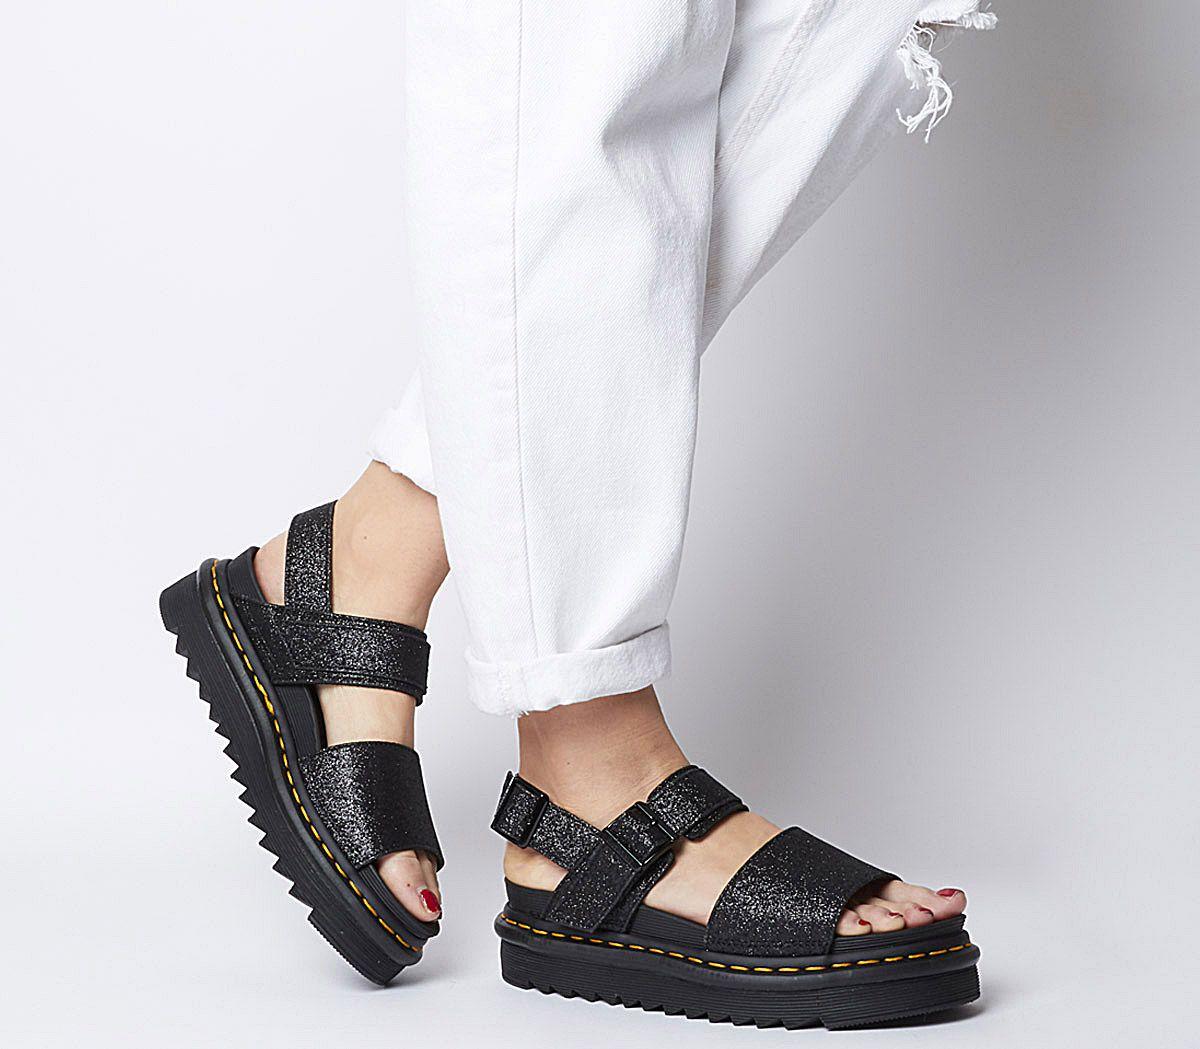 5ad2aced531 Dr. Martens Voss Sandals Black Fine Glitter - Sandals